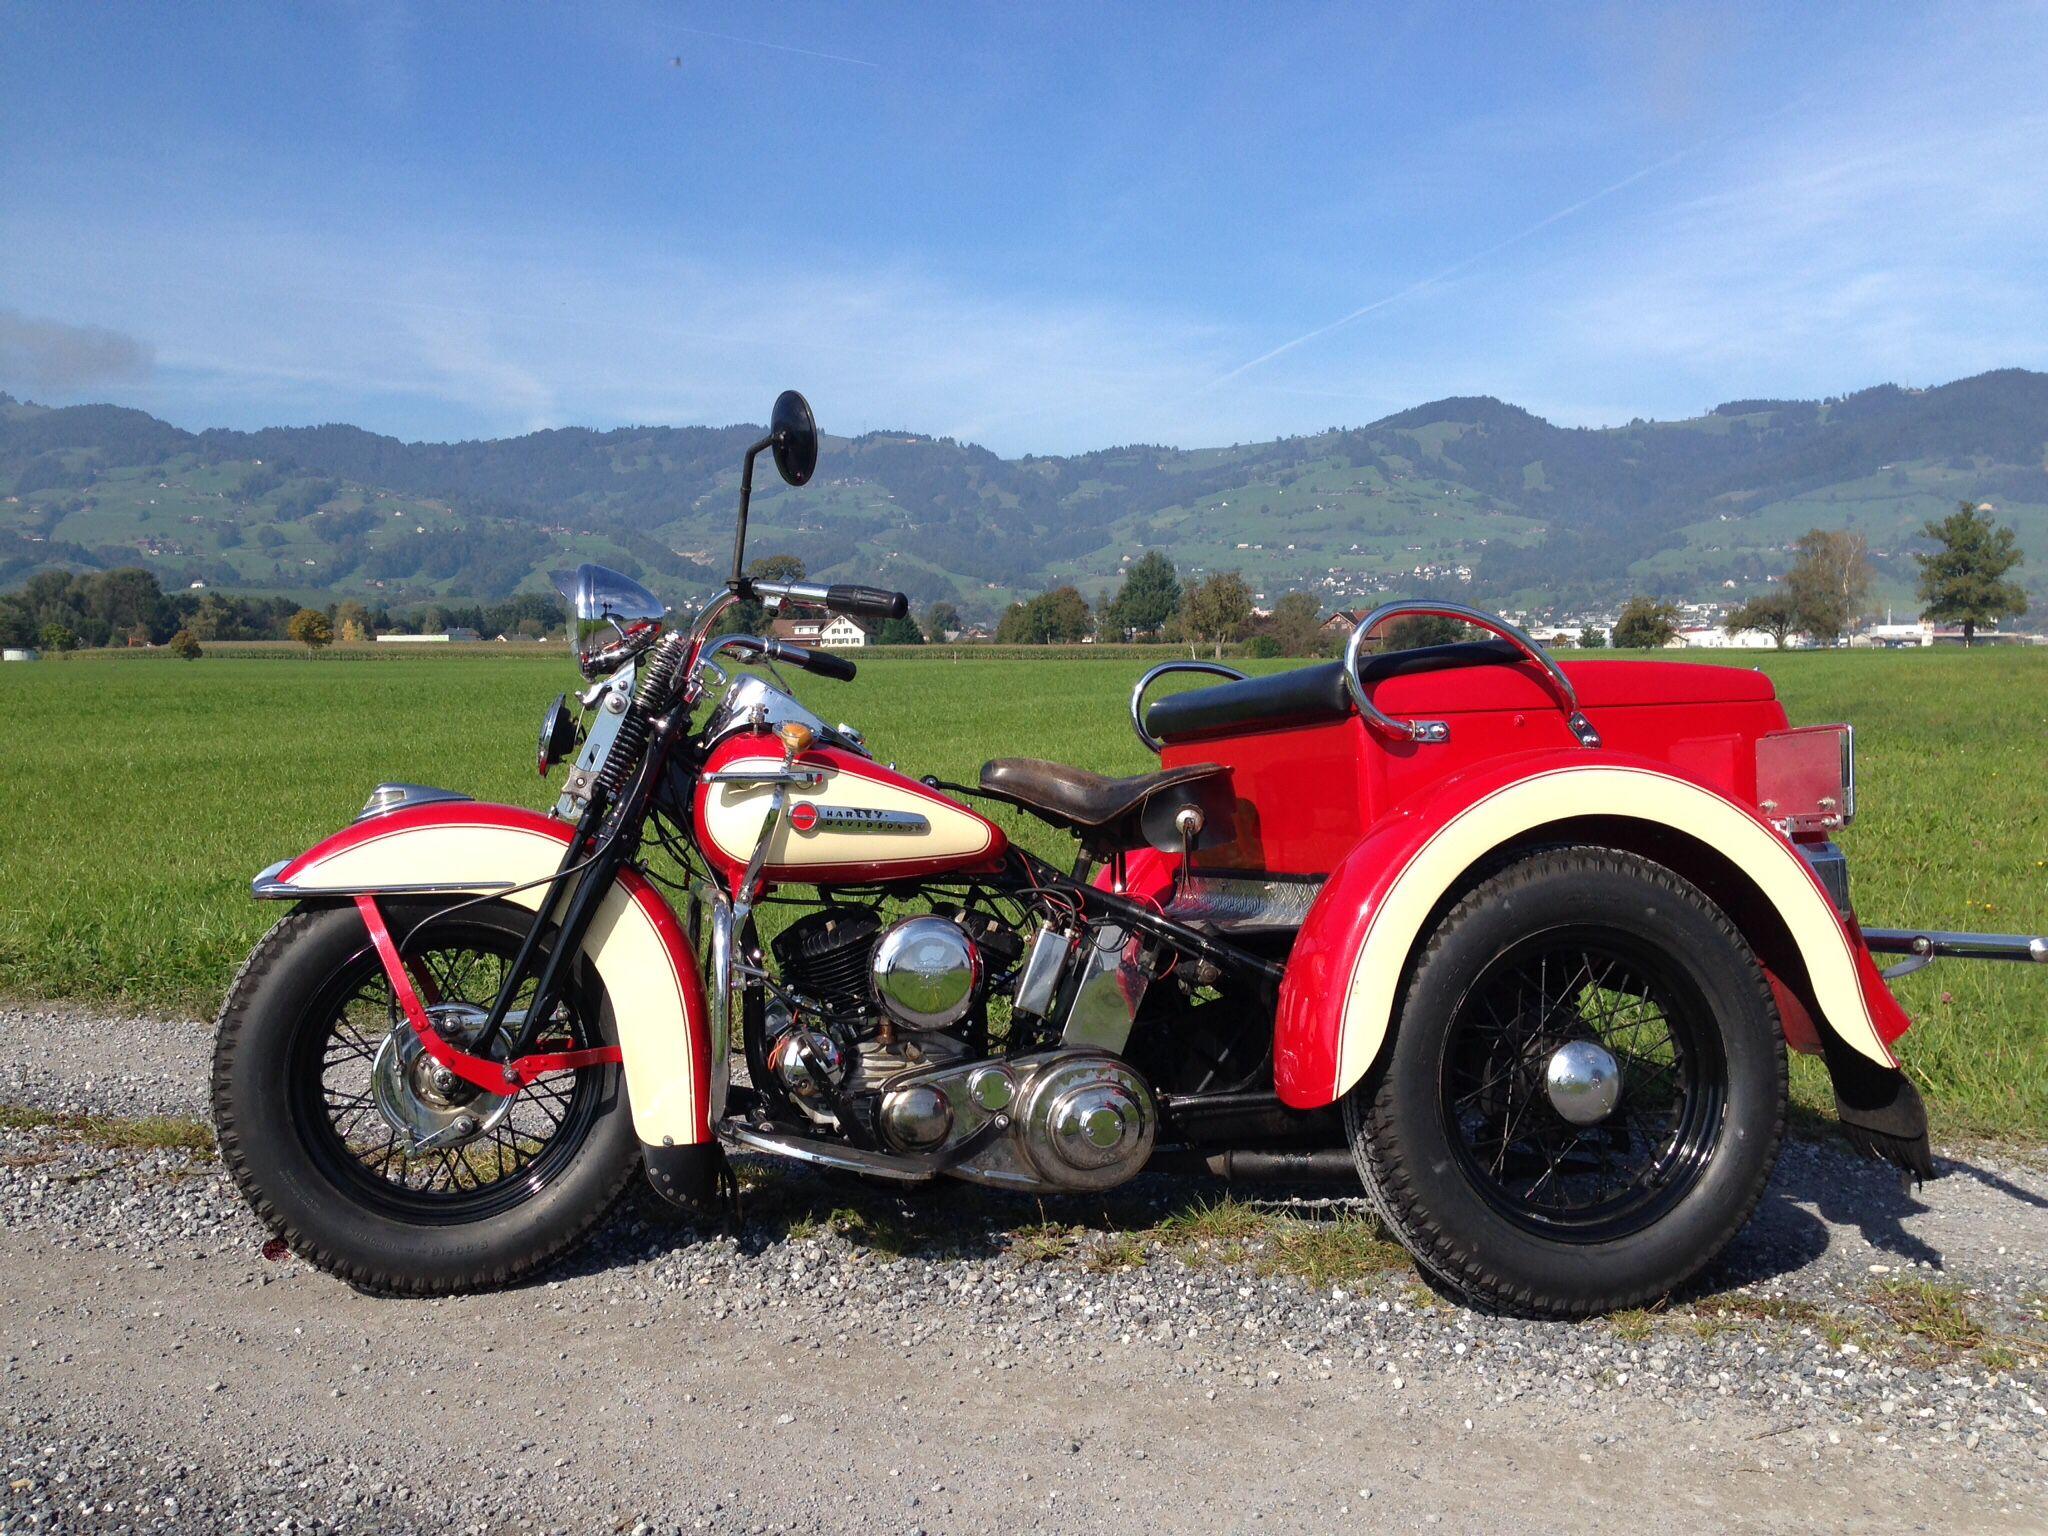 1941 Servi Car On Tour In East Switzerland Trike Motorcycle Vintage Harley Davidson Harley Davidson Motorcycles